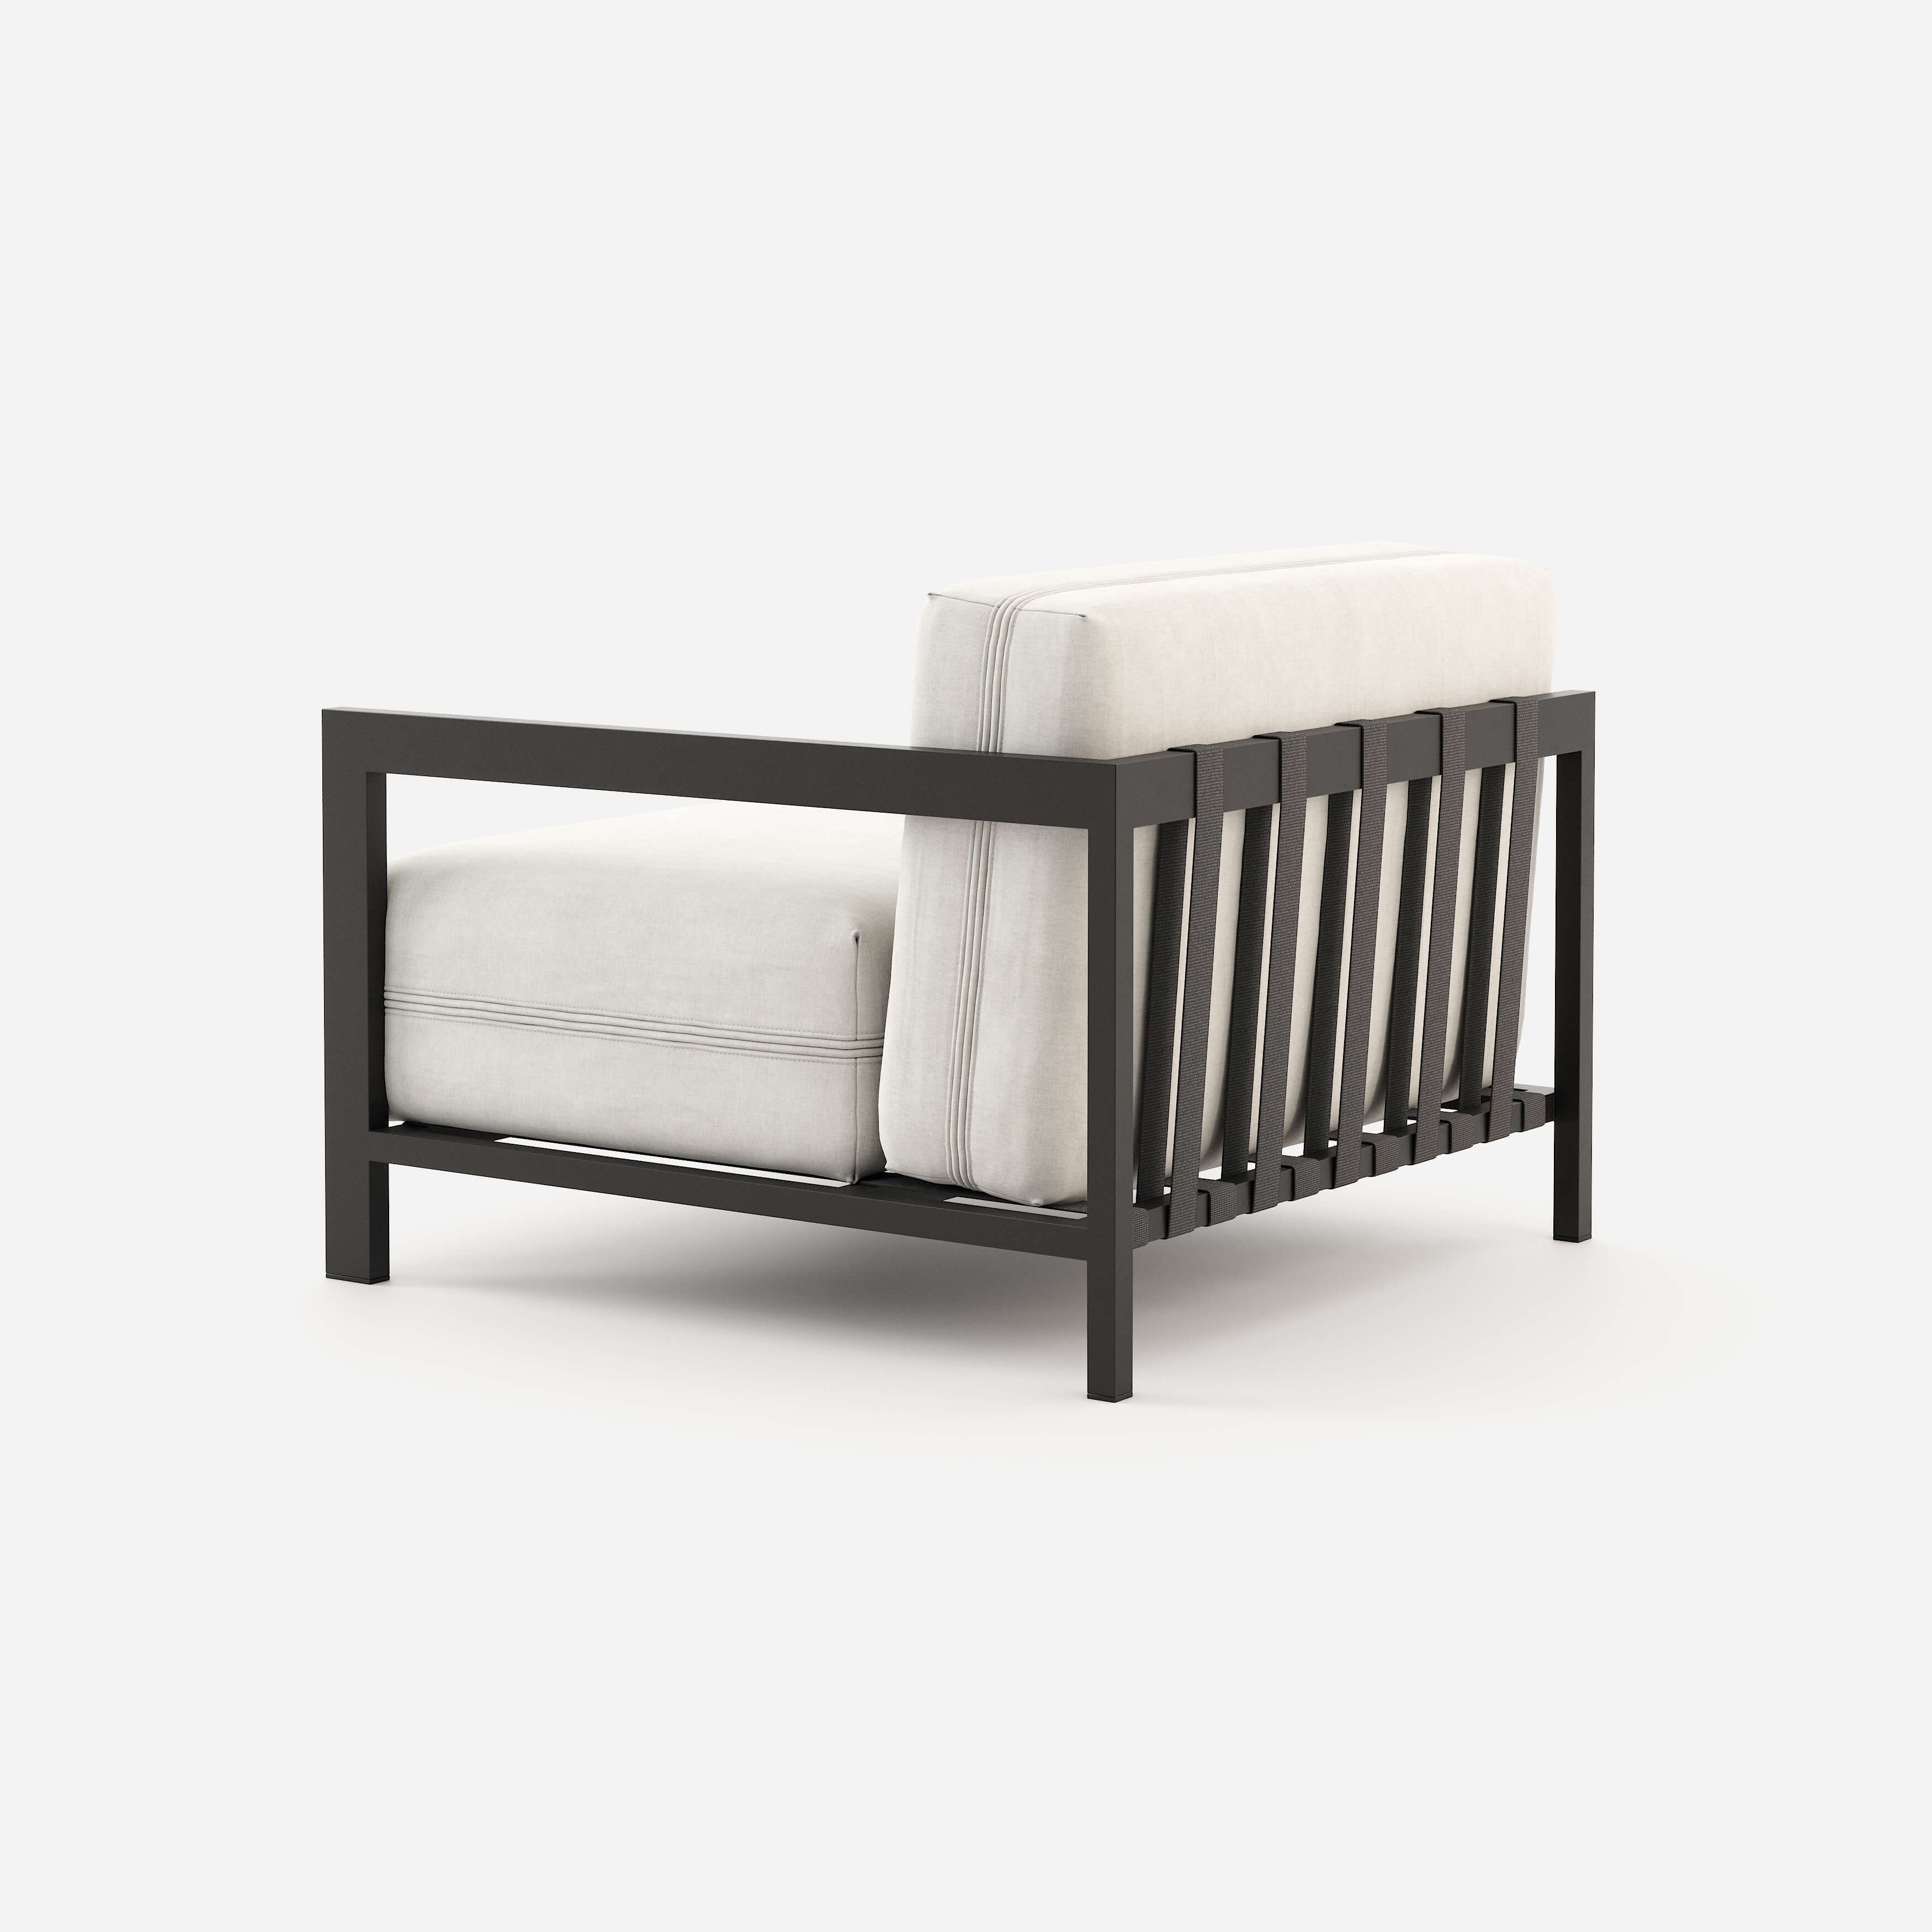 Bondi Right Armrest-domkapa-outdoor-collection-interior-design-home-decor-white-furniture-4